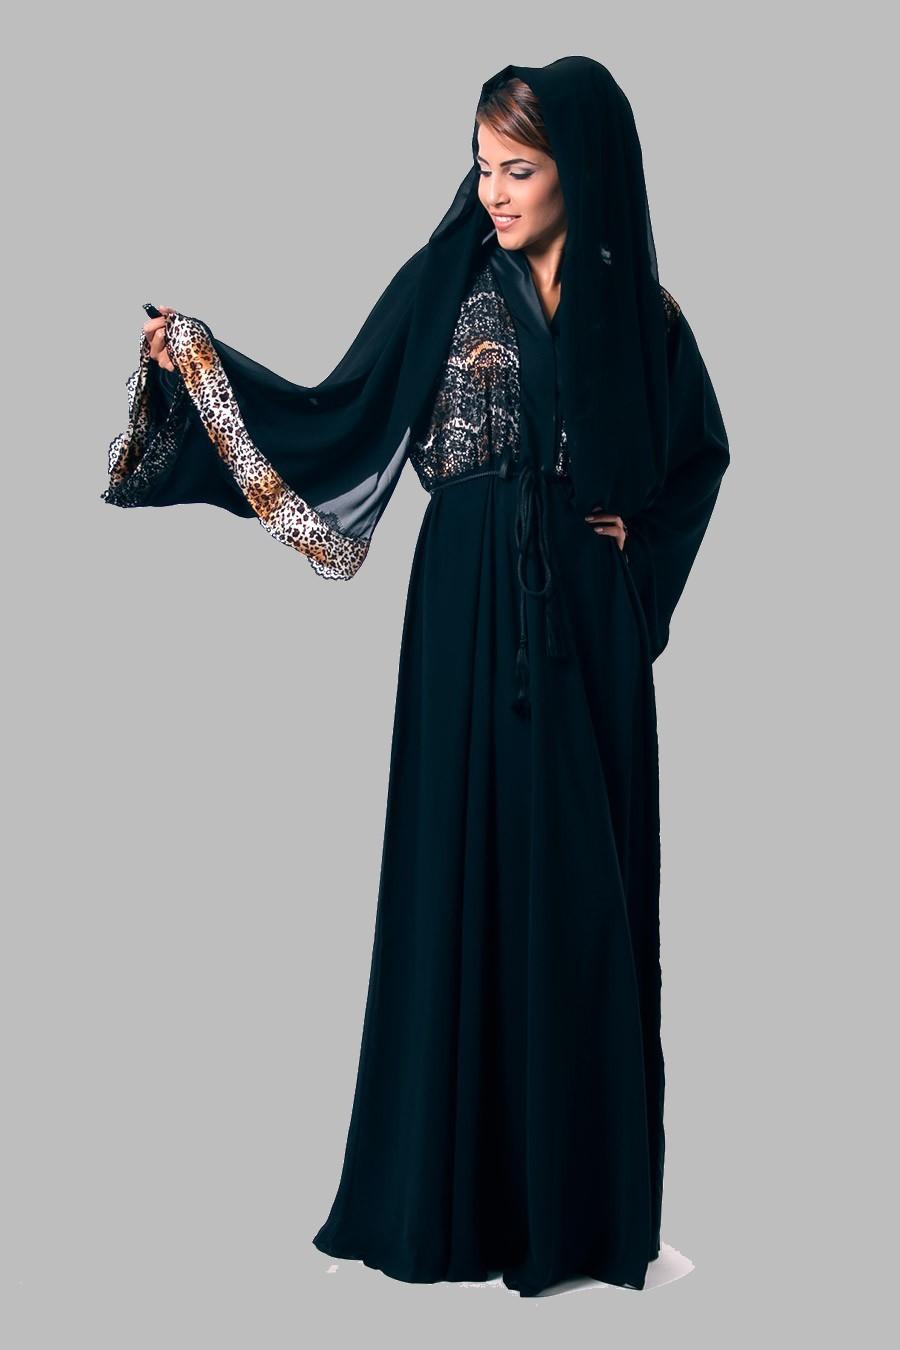 Traditional Costume clipart abaya UAE Traditional Women Dress Wear